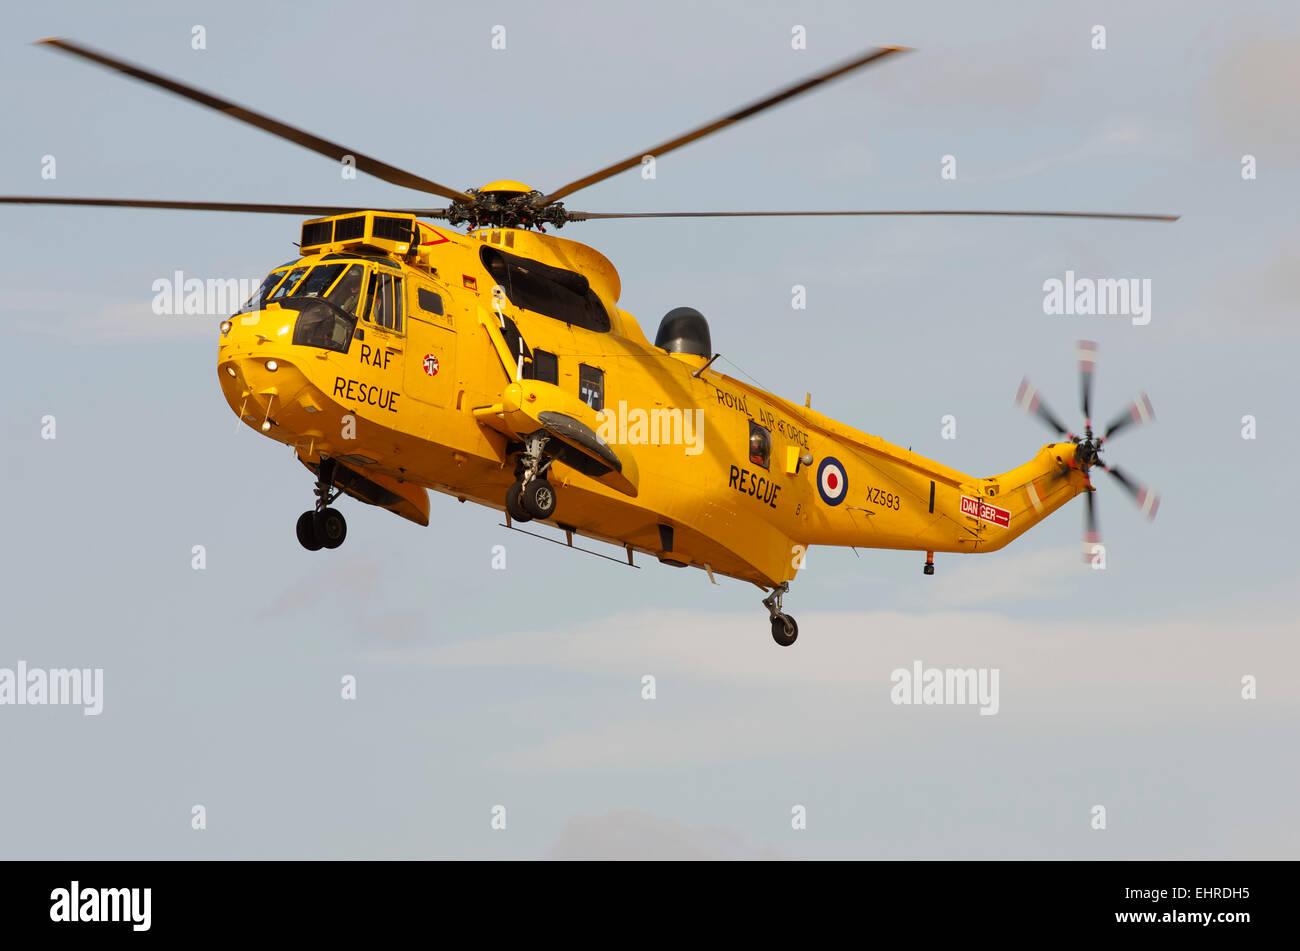 Westland Seaking Helicopter, Rhyl Air Display - Stock Image